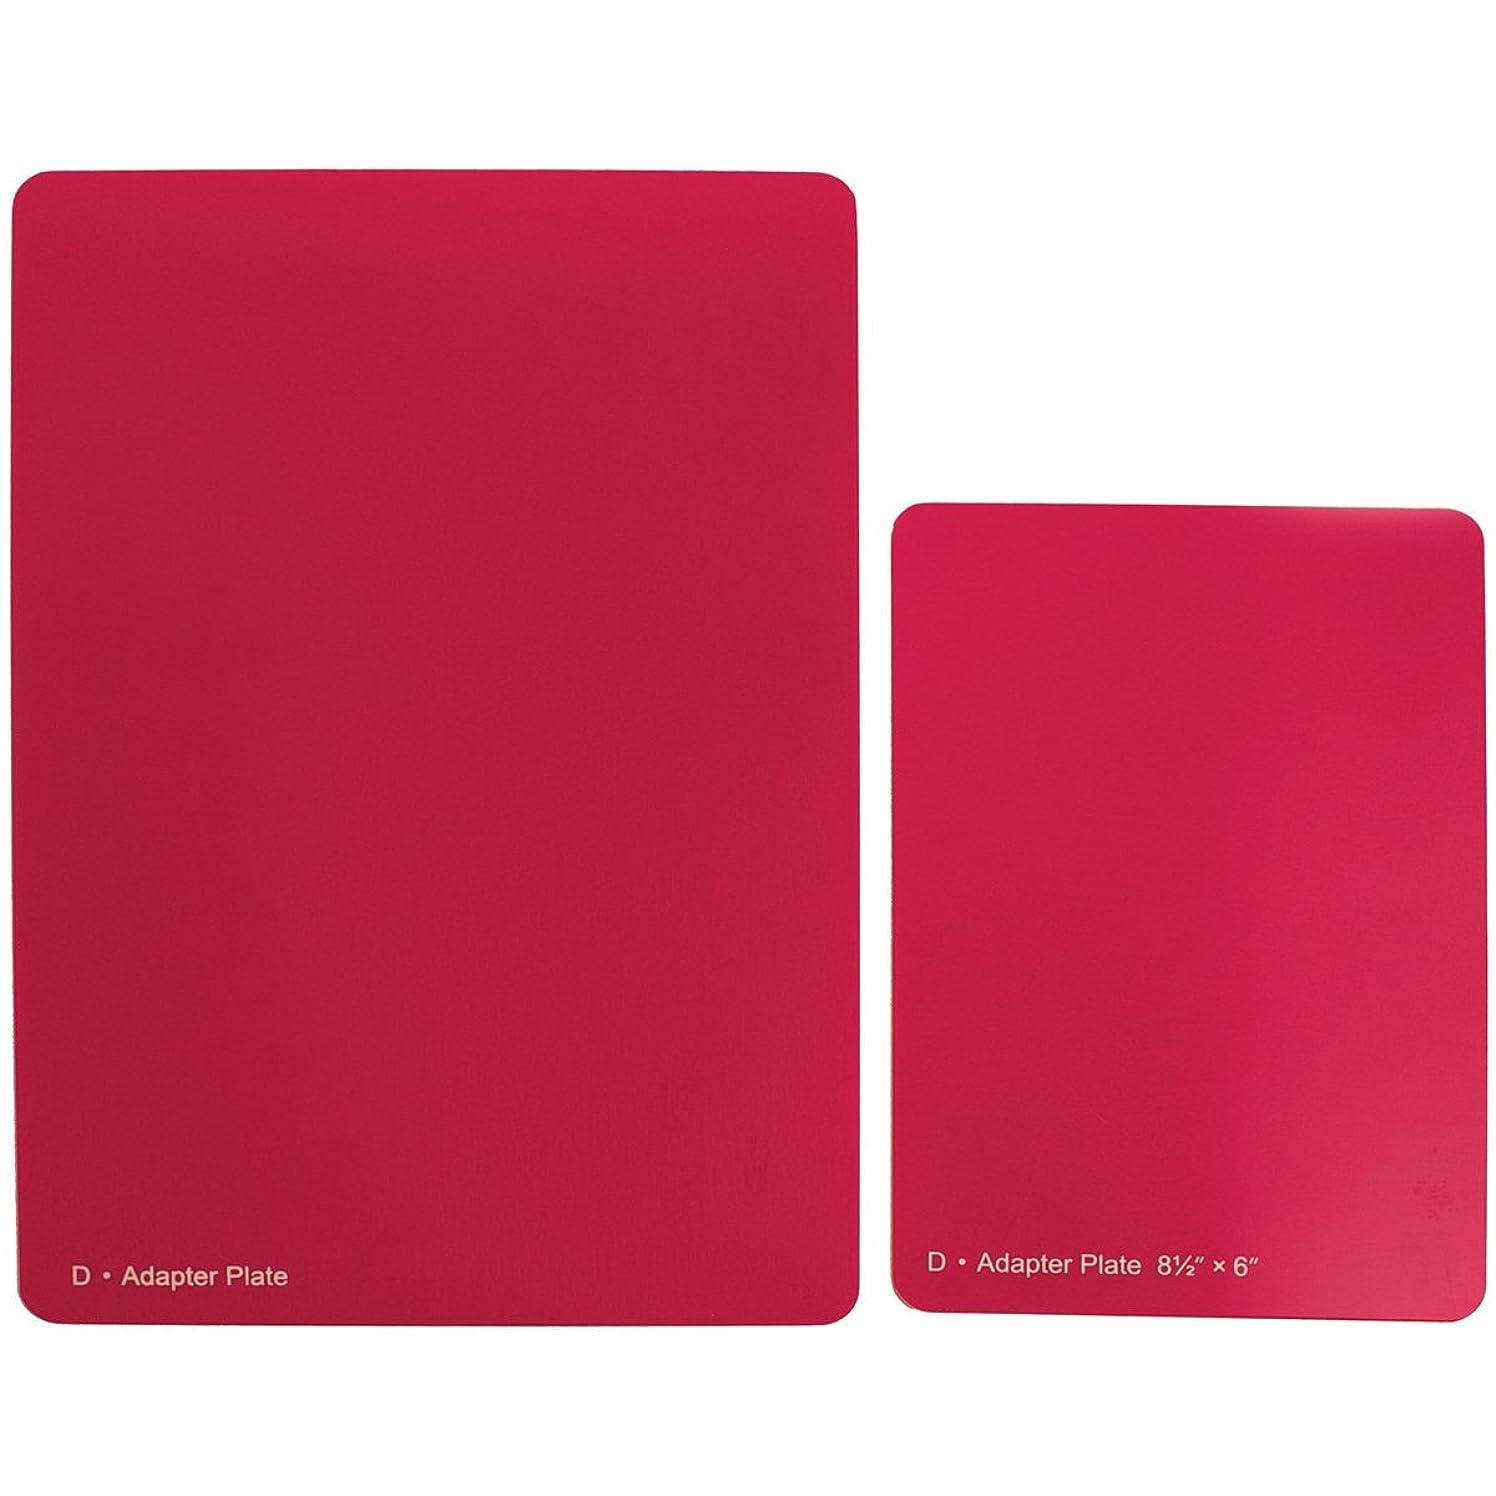 Spellbinders Grand Calibur Spacer Plate, 8.5 by 12-Inch, Raspberry